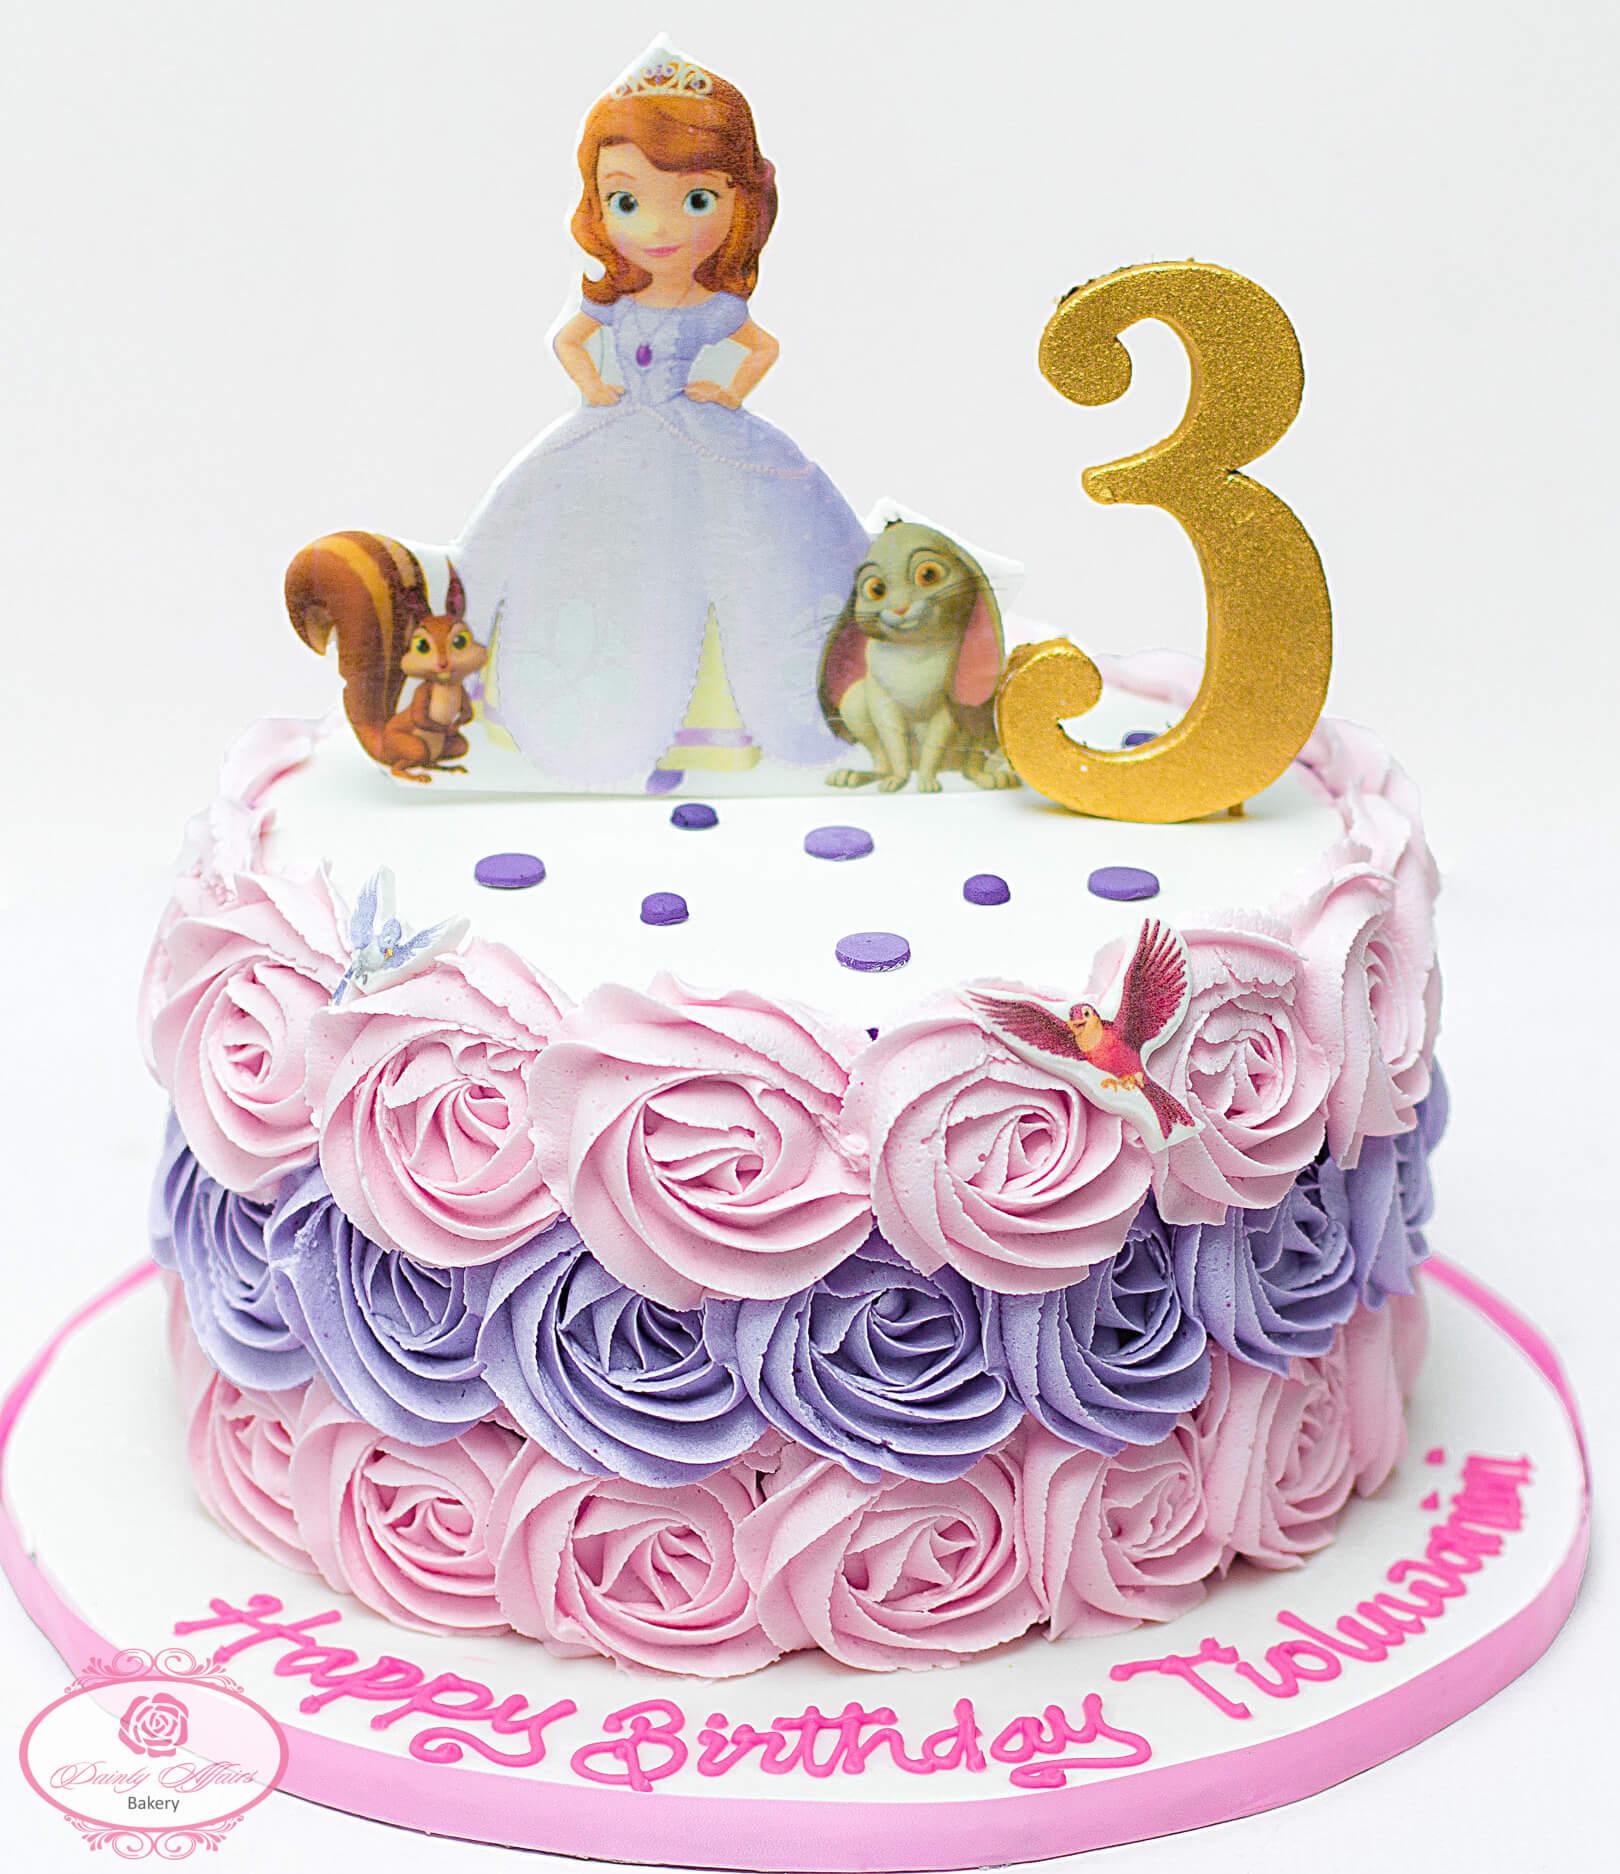 Rosette Butter Cream Character Cake Dainty Affairs Bakery